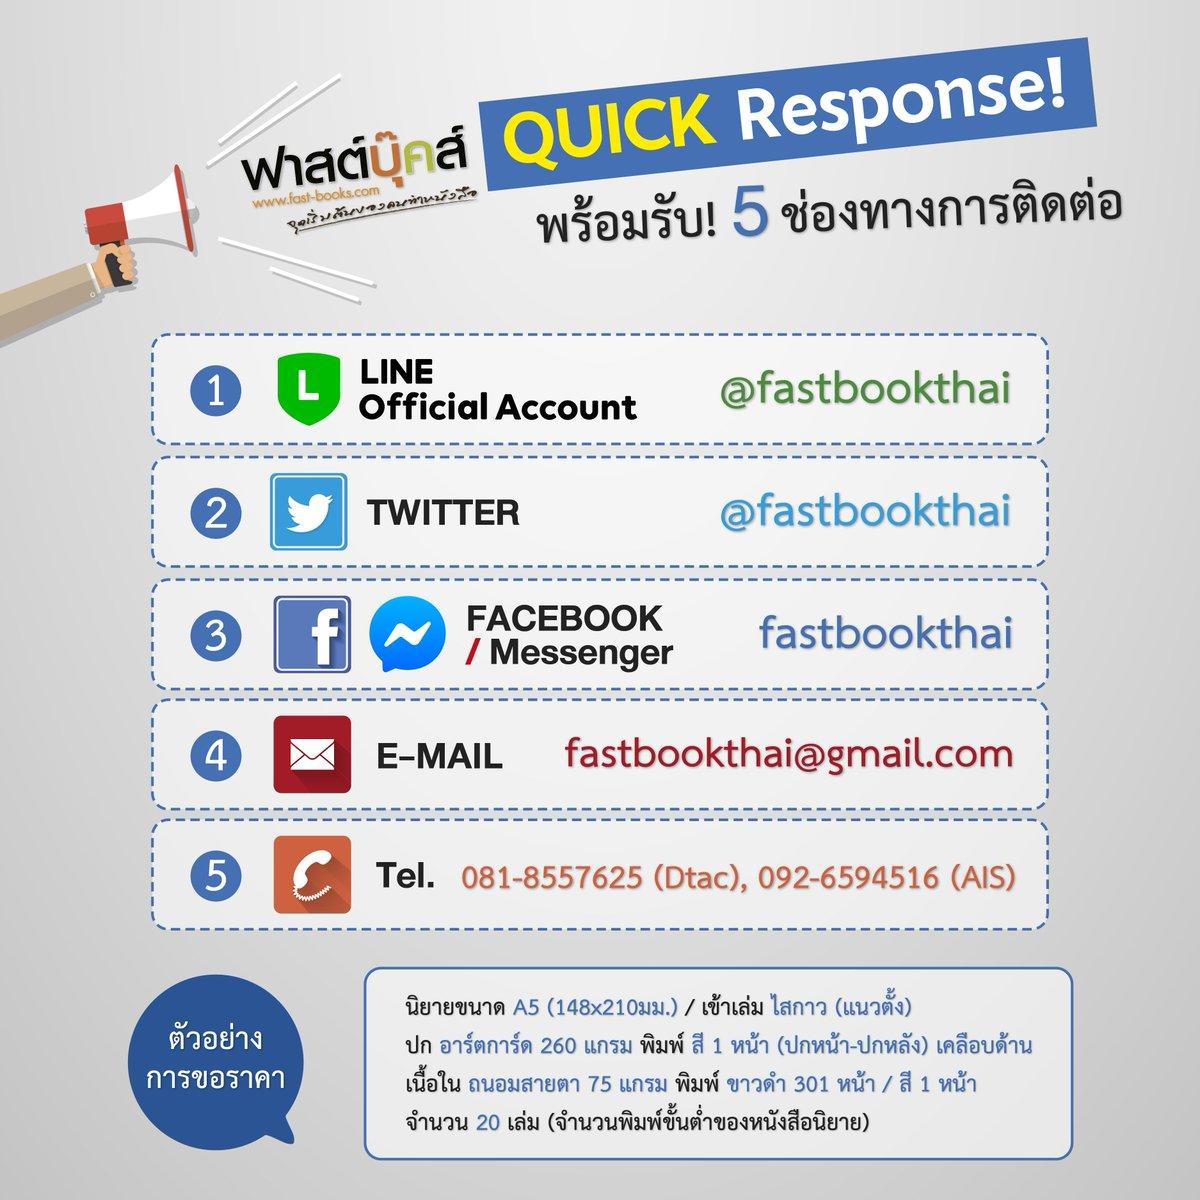 fastbooks (@fastbookthai) | Twitter